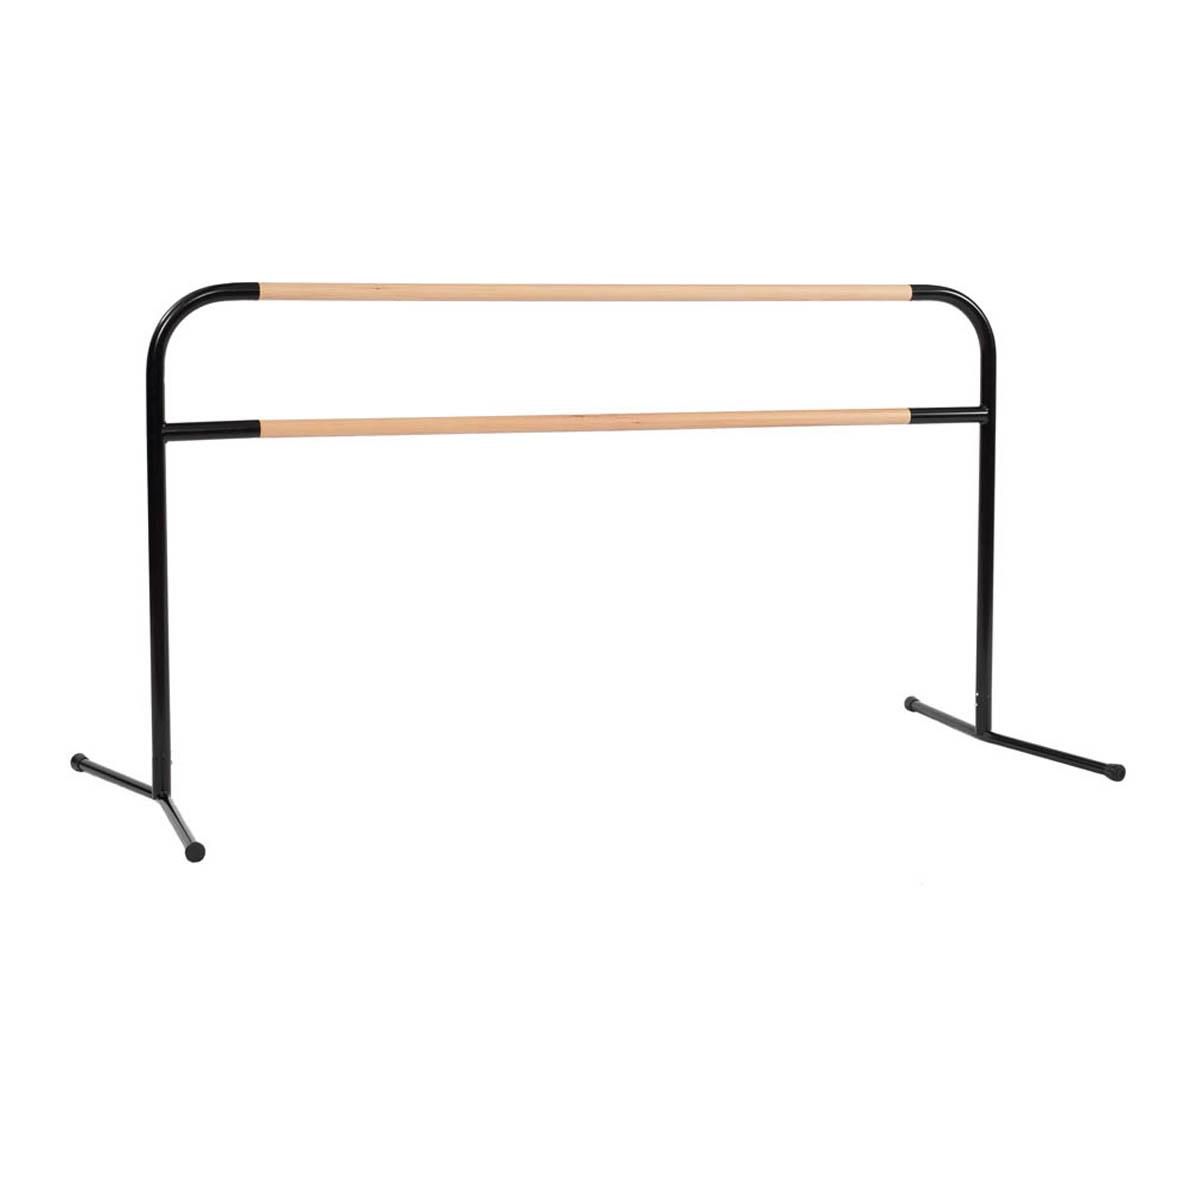 studiobarre aluminum base with wood horizontal barres. Black Bedroom Furniture Sets. Home Design Ideas